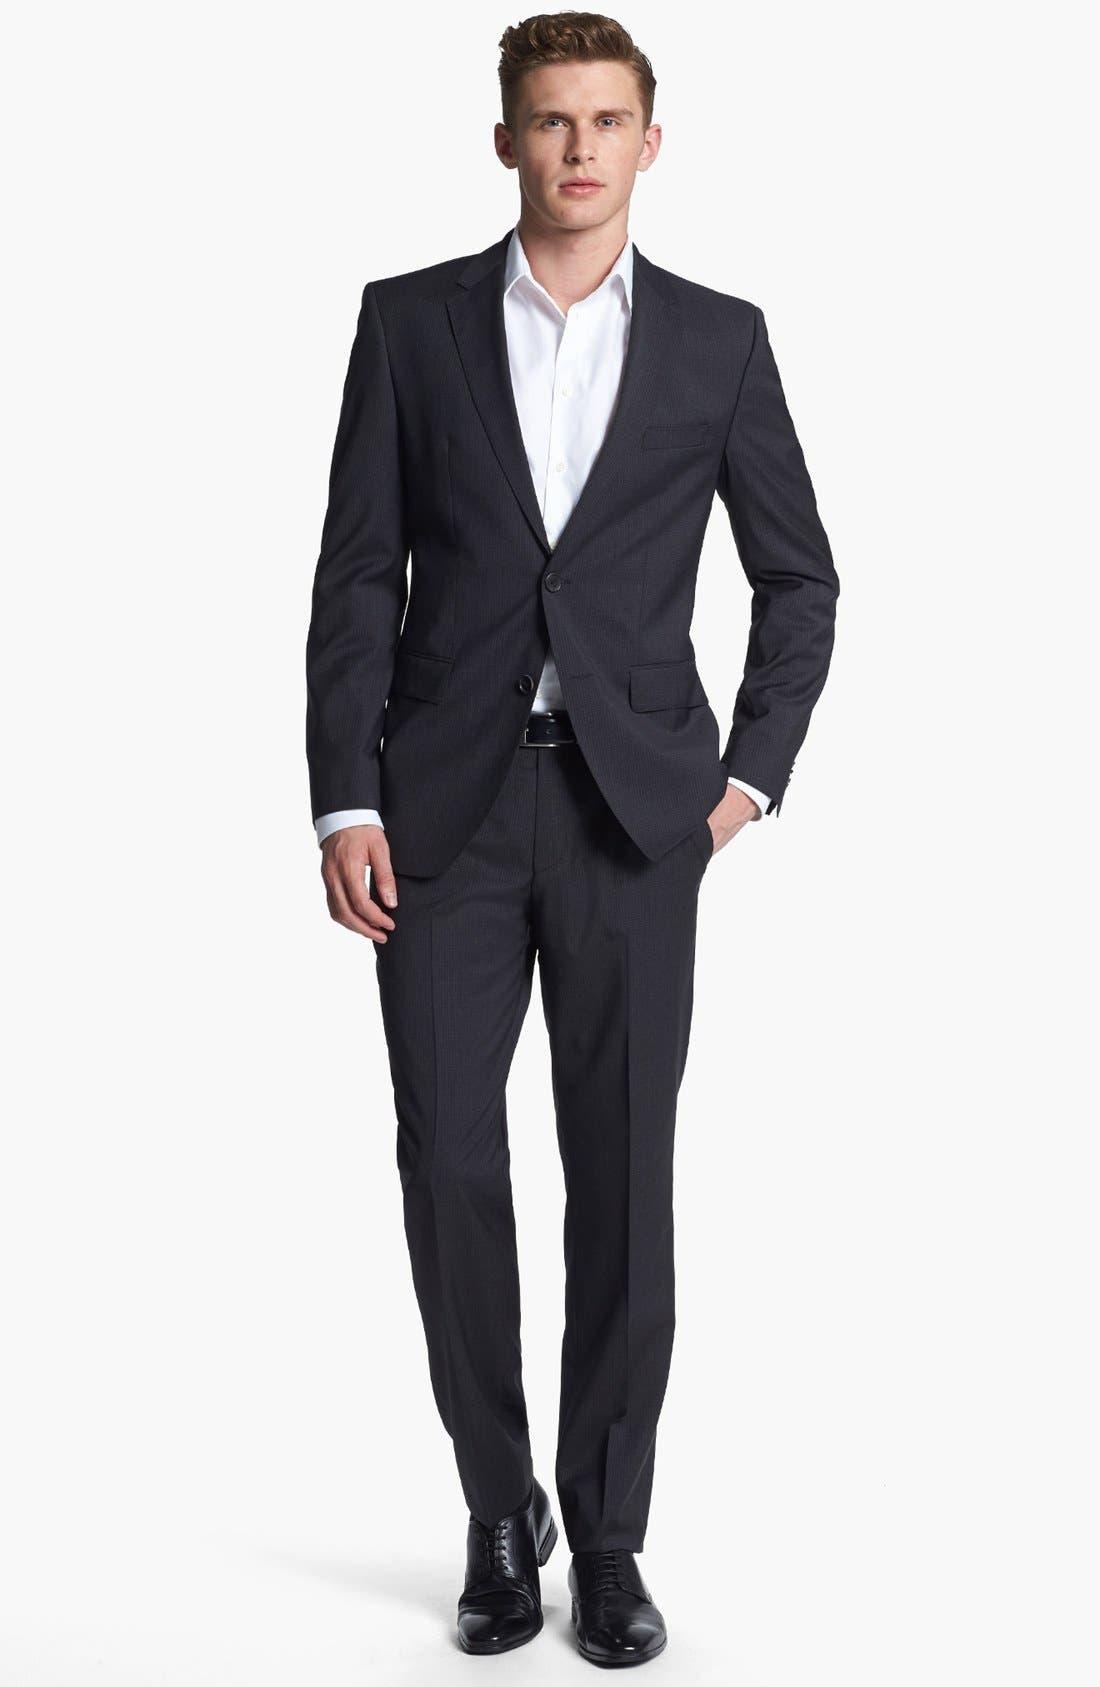 Alternate Image 1 Selected - BOSS HUGO BOSS 'James/Sharp' Trim Fit Check Suit